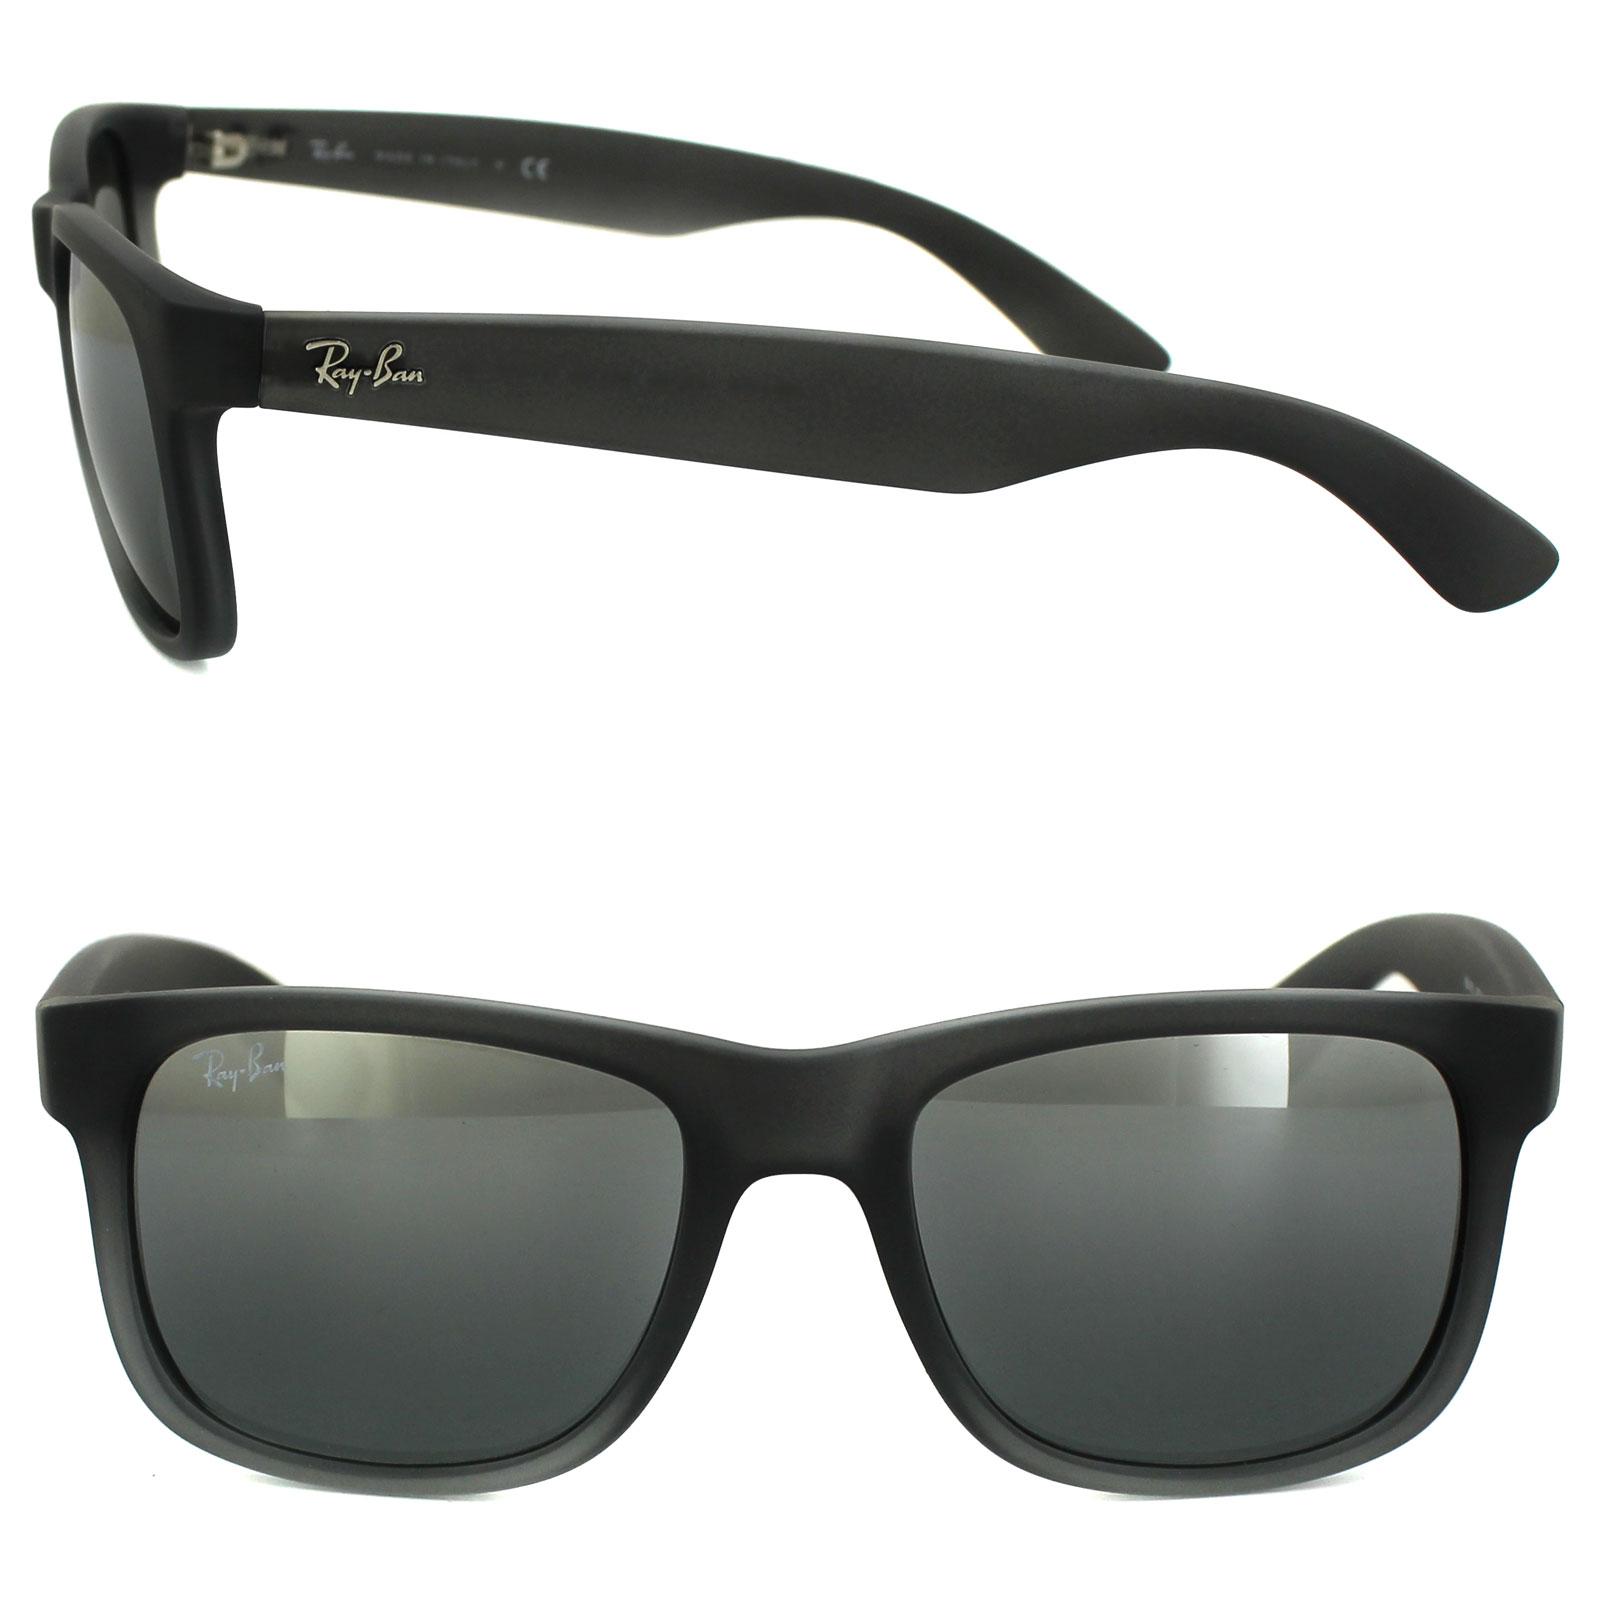 ce8814c8a0 Sentinel RayBan Sunglasses Justin 4165 852 88 Rubber Grey Grey Silver  Mirror Gradient